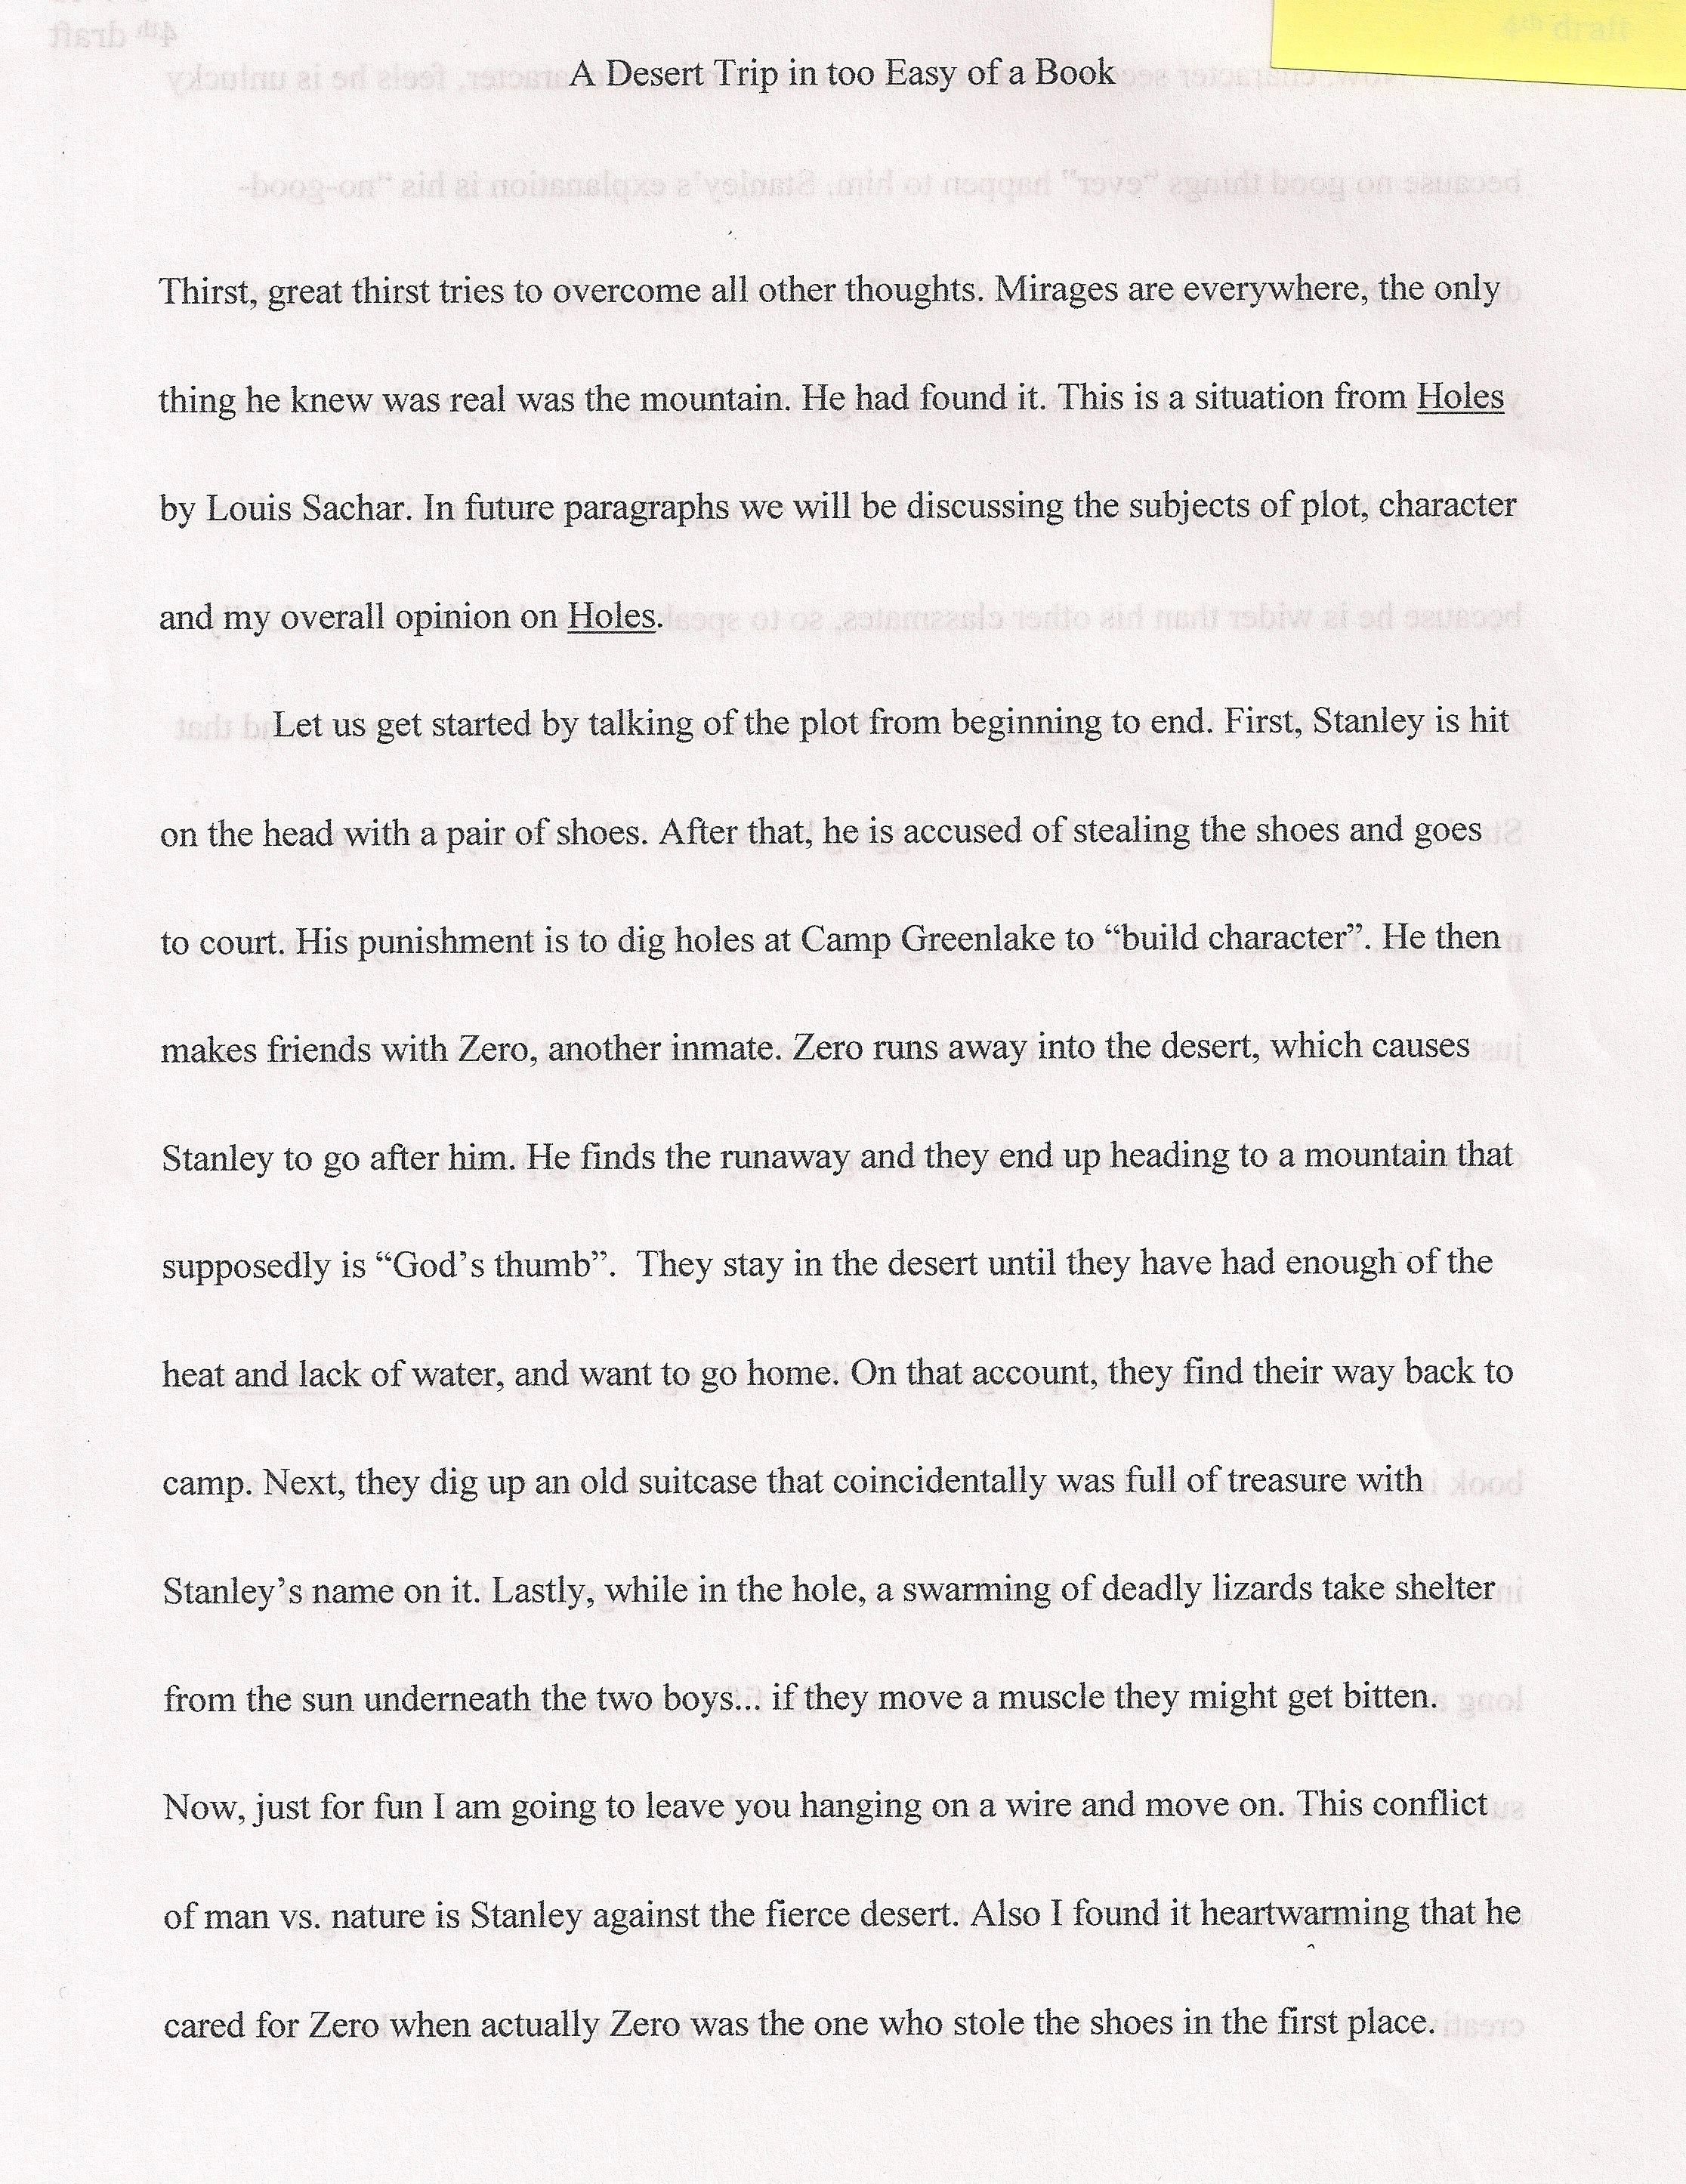 017 Desert Trip Essay Example Grabbers For Imposing Essays Good Interesting Attention College Full